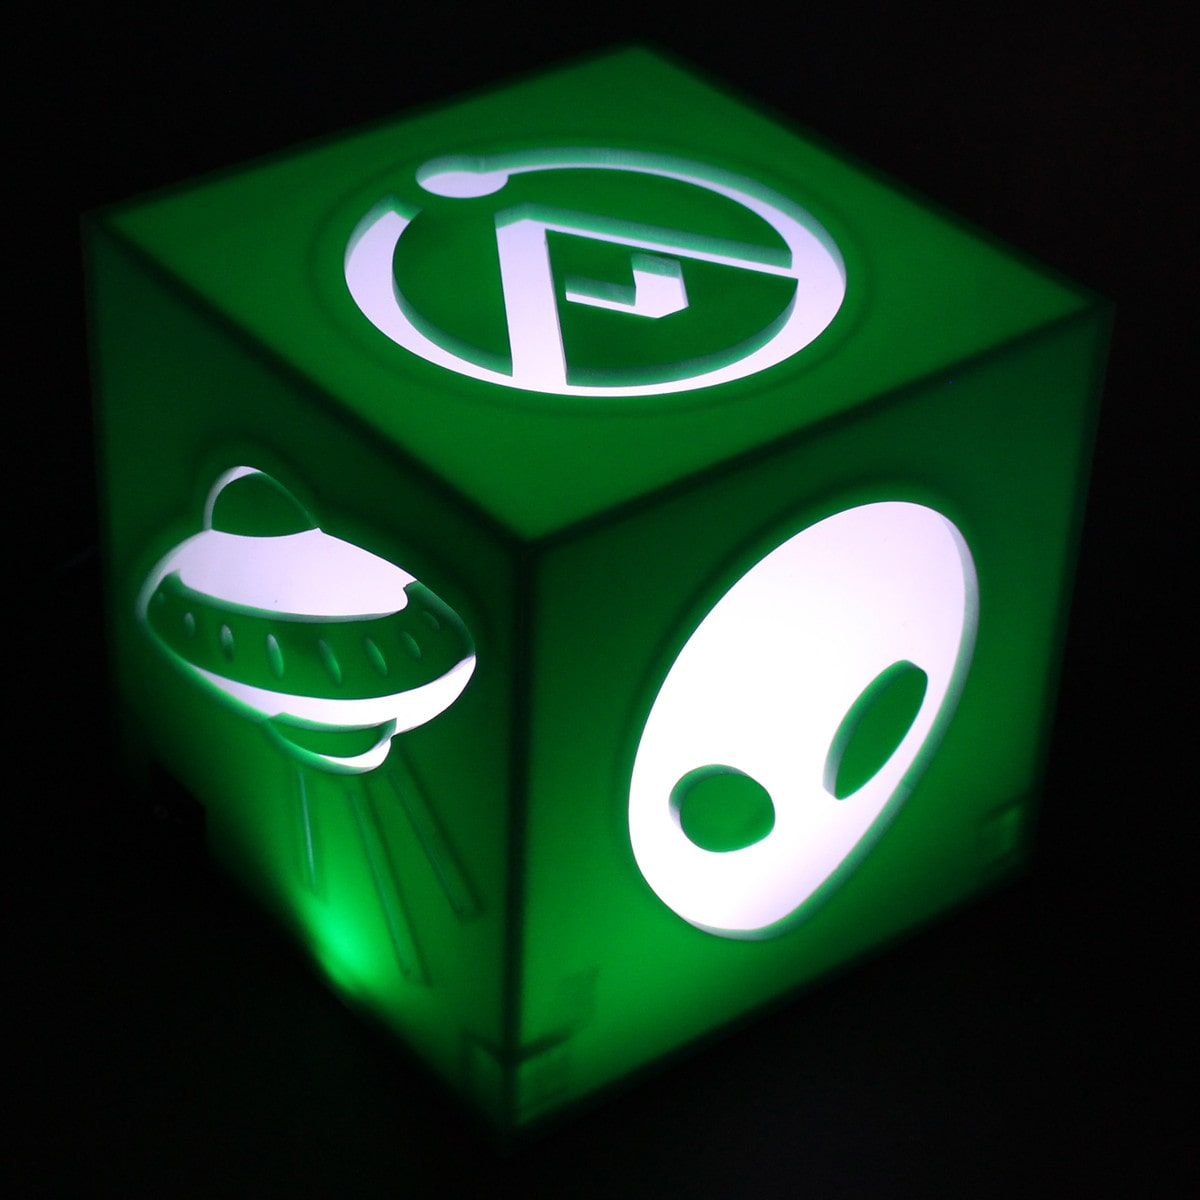 Luminária Cubo: Ufologia